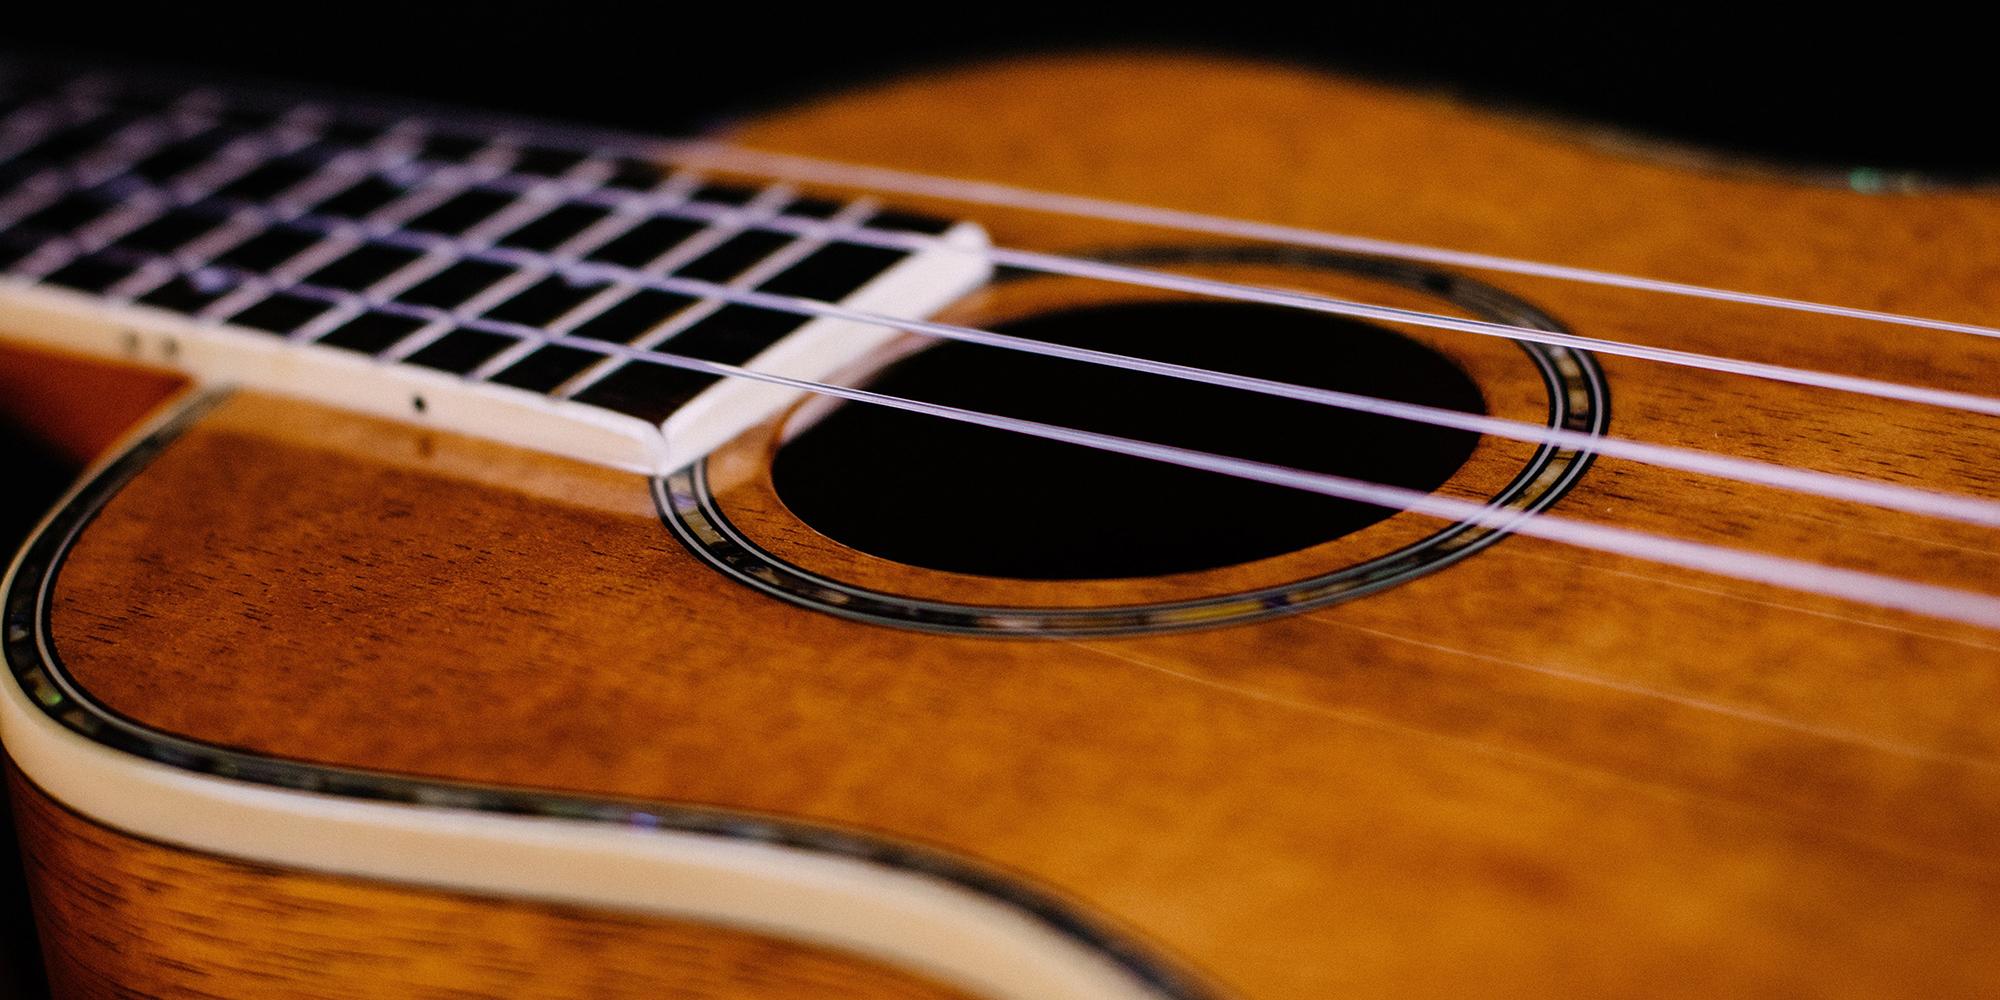 Up close photo of a guitar